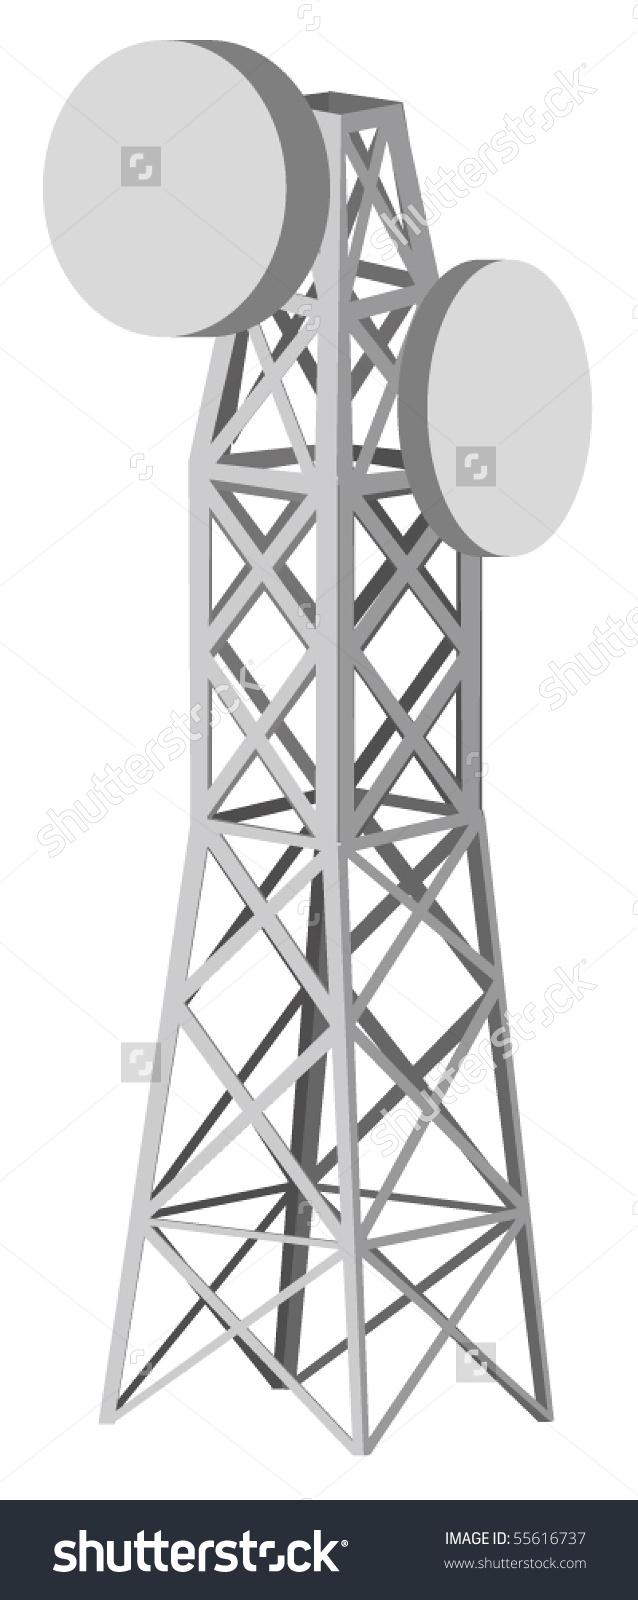 Vector Illustration Antenna Tower Stock Vector 55616737.